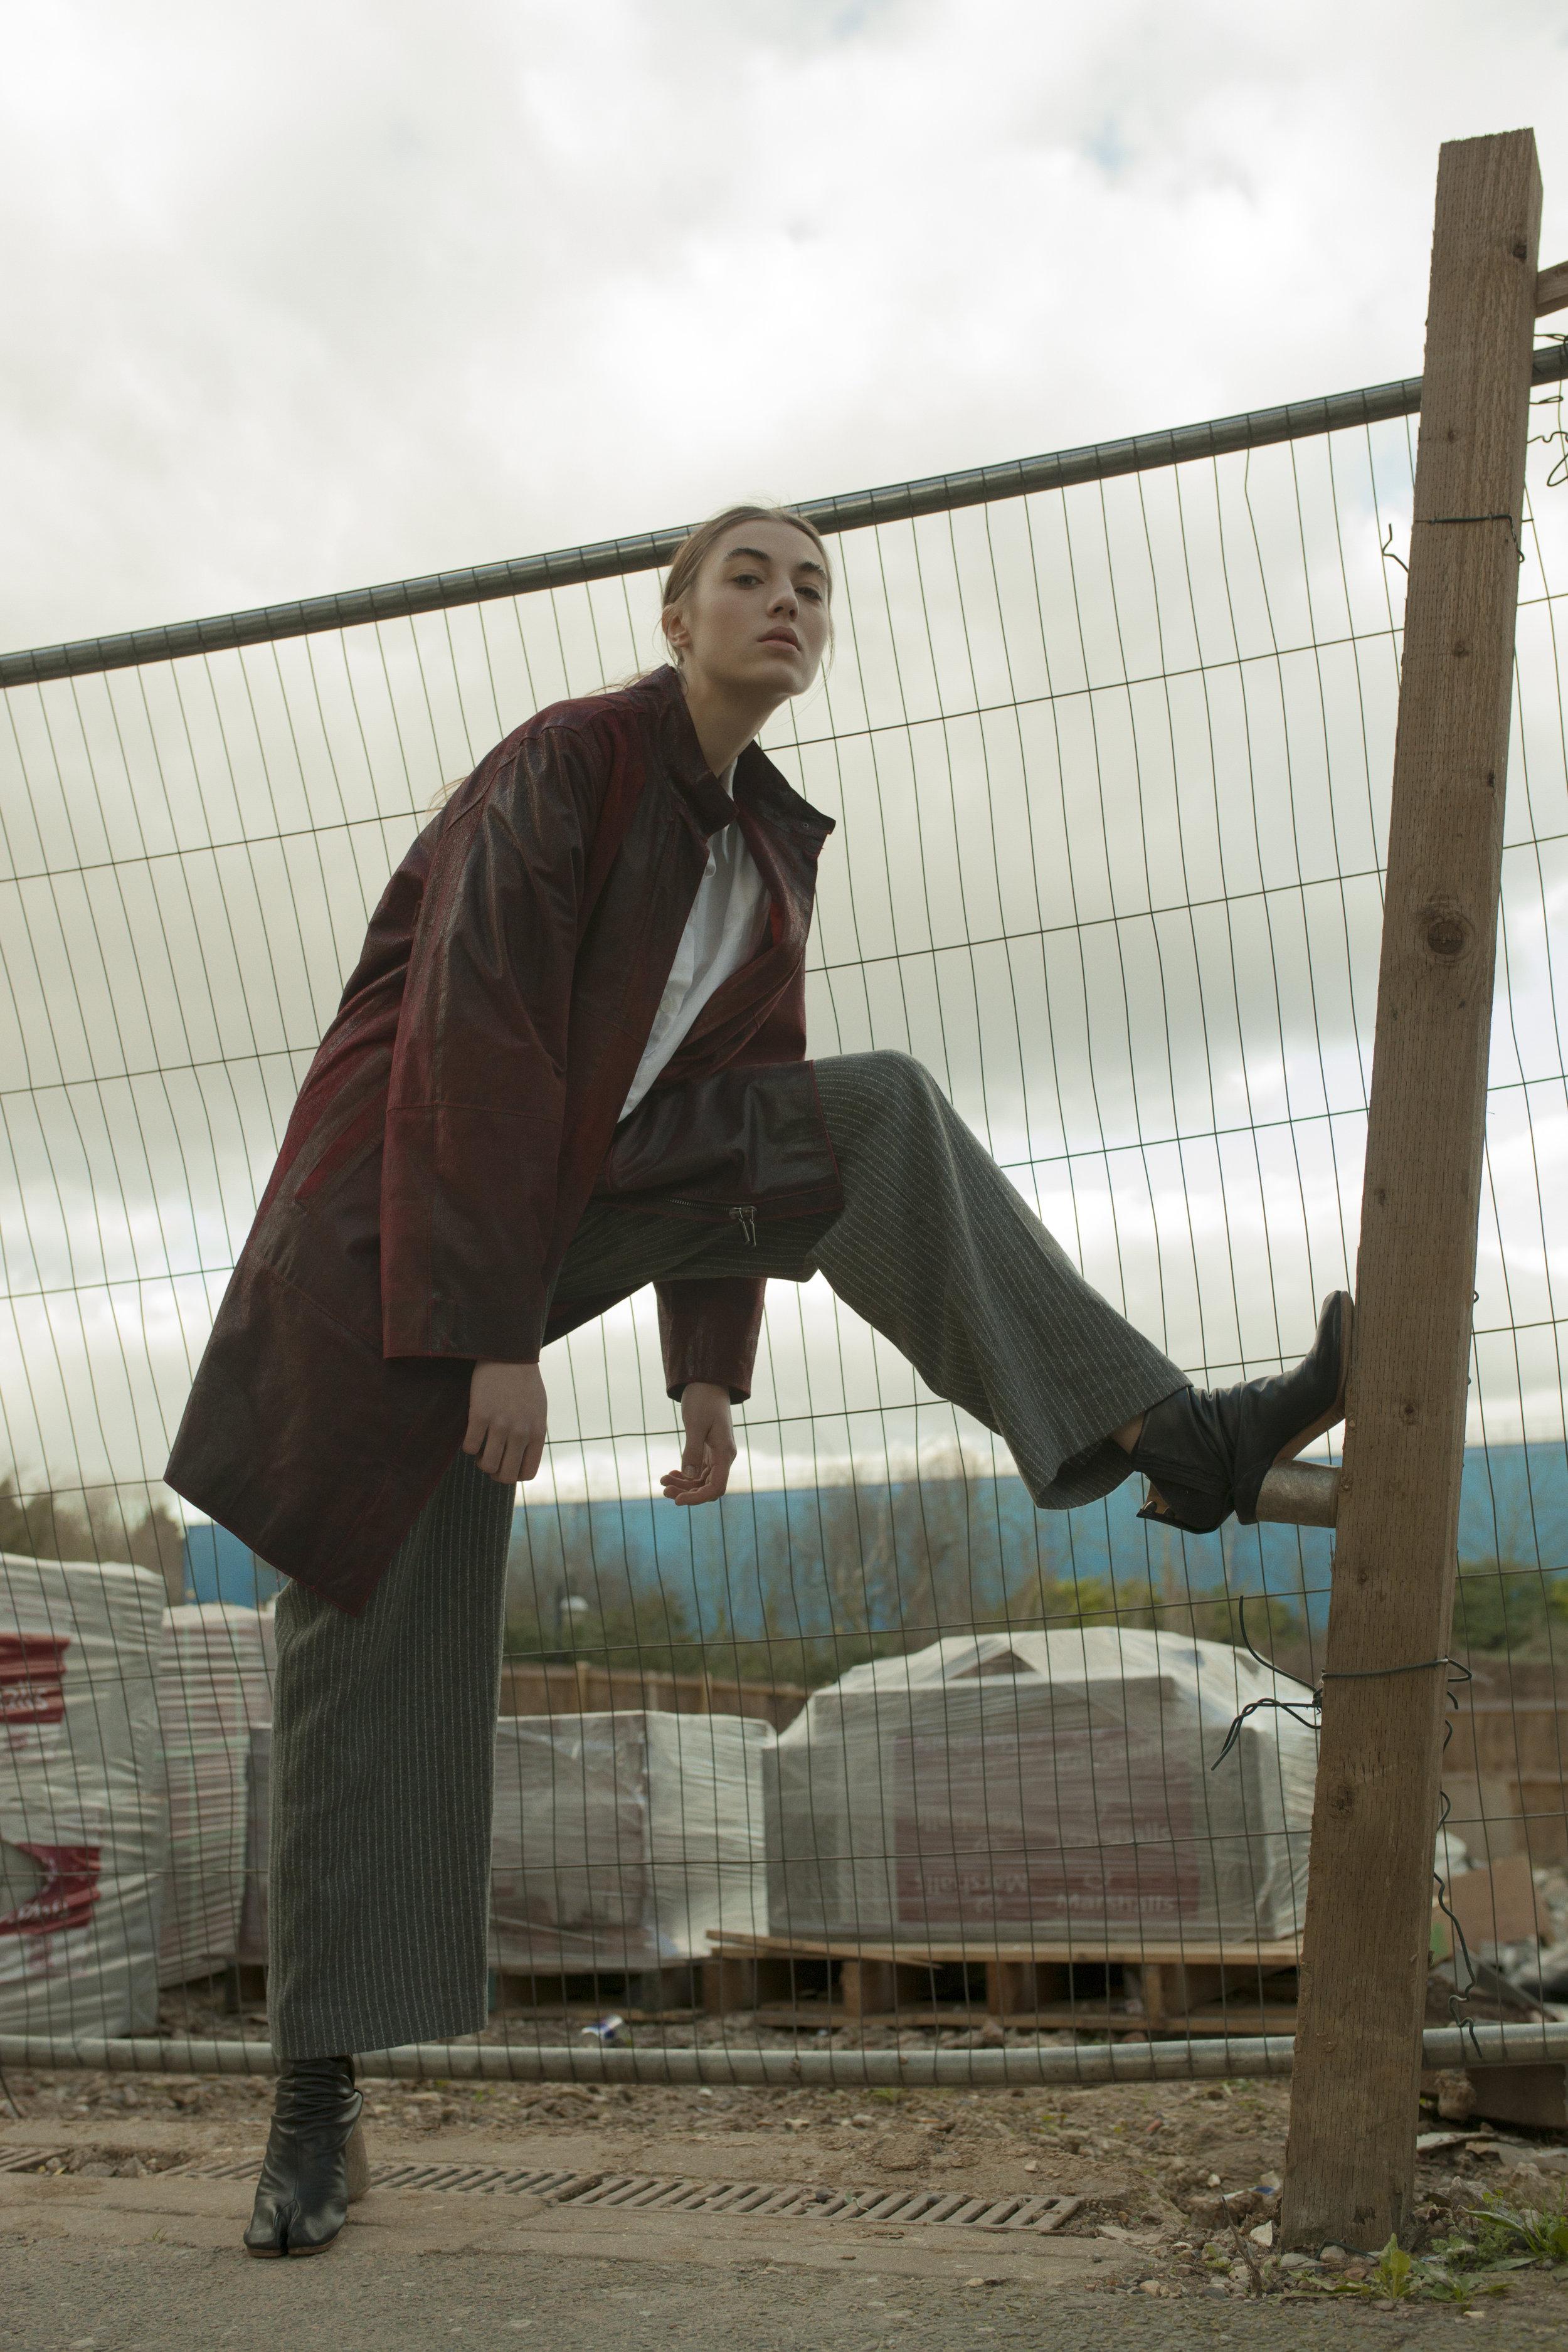 jacket and trousers STYLIST'S OWN, shirt MM6 MAISON MARGIELA, boots MAISON MARGIELA